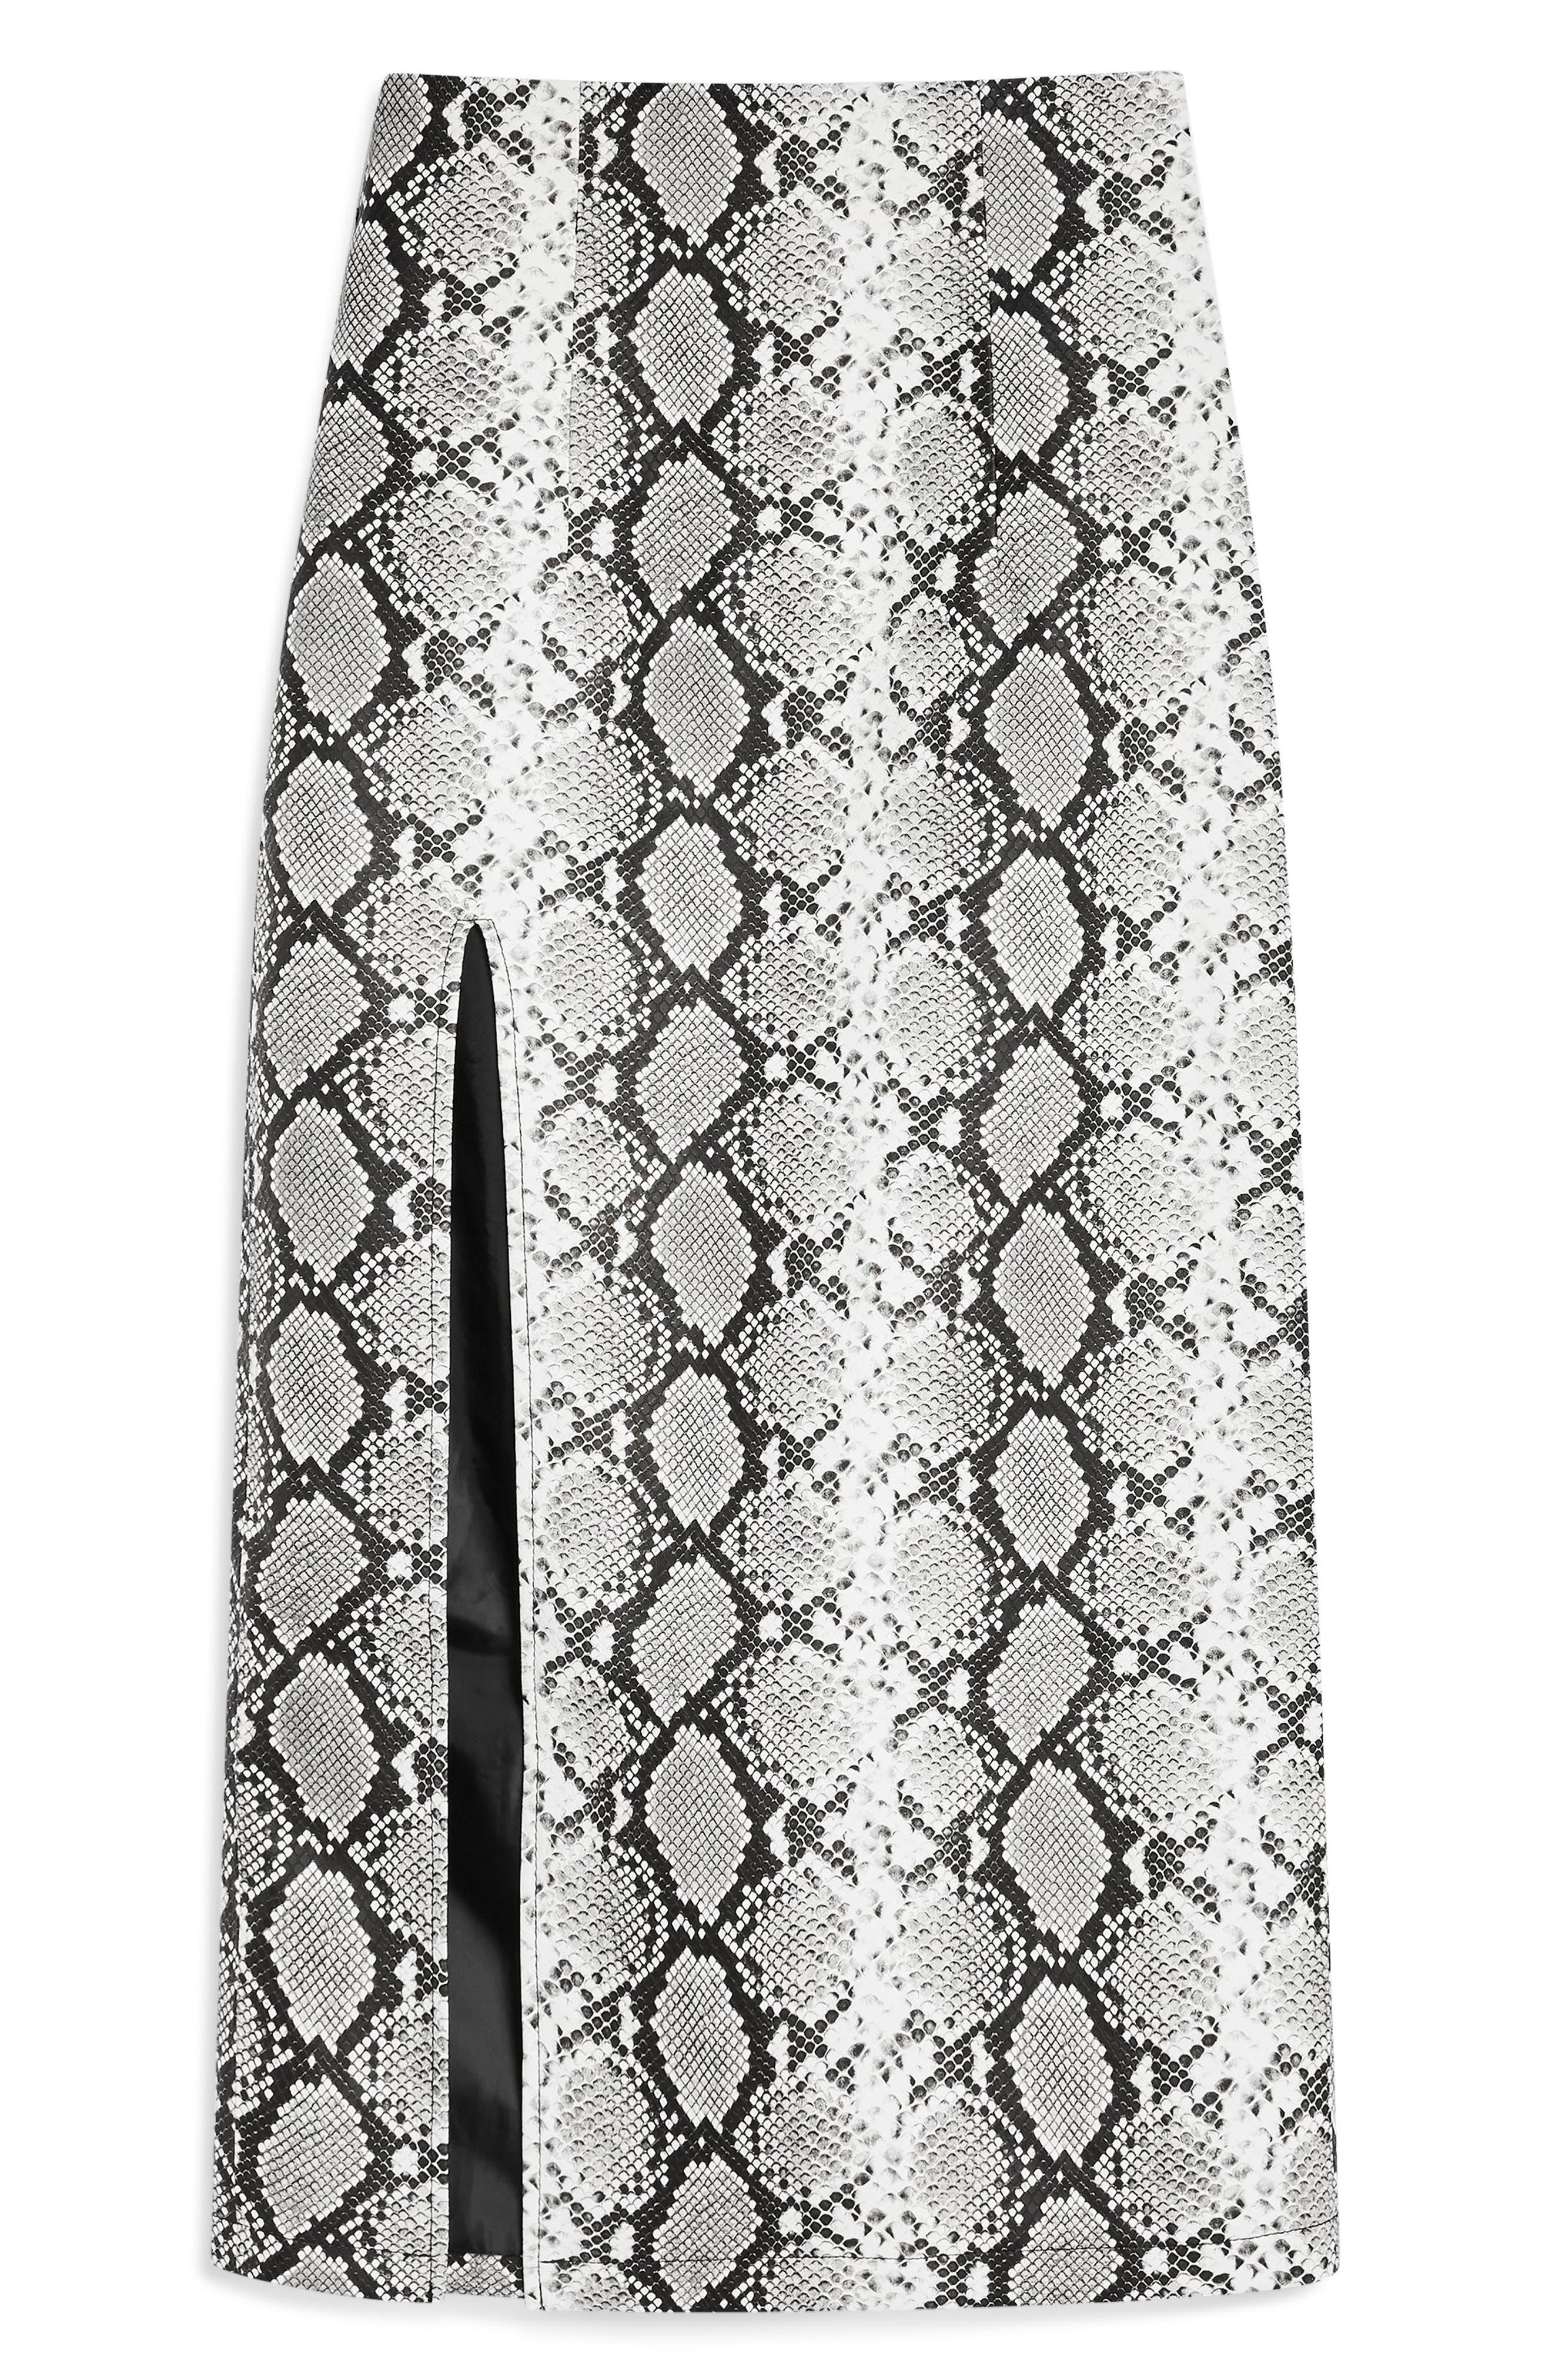 TOPSHOP, Snake Print Faux Leather Midi Skirt, Alternate thumbnail 4, color, 002